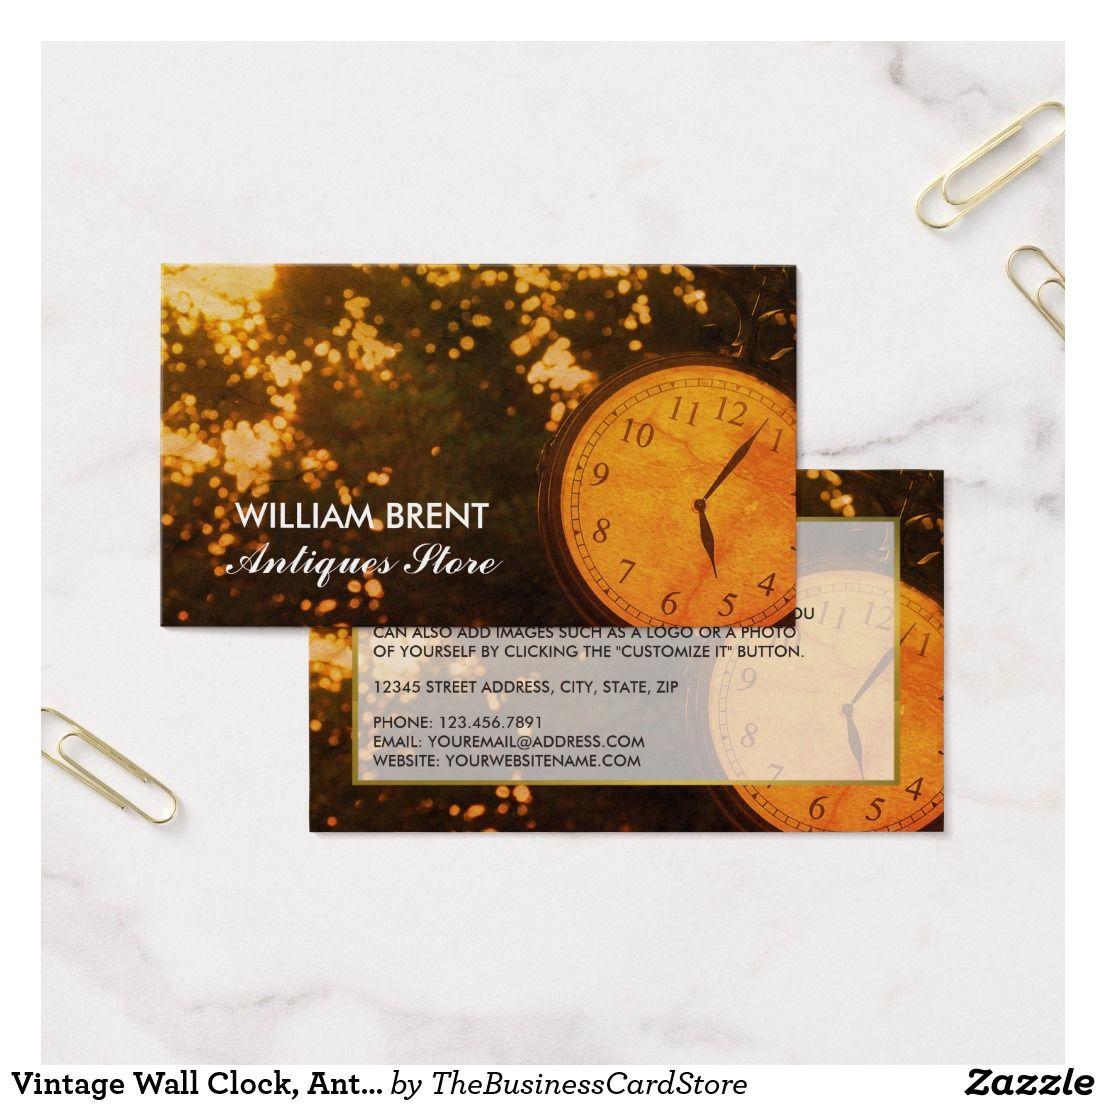 Vintage Wall Clock, Antique Business Card   Business   Pinterest ...